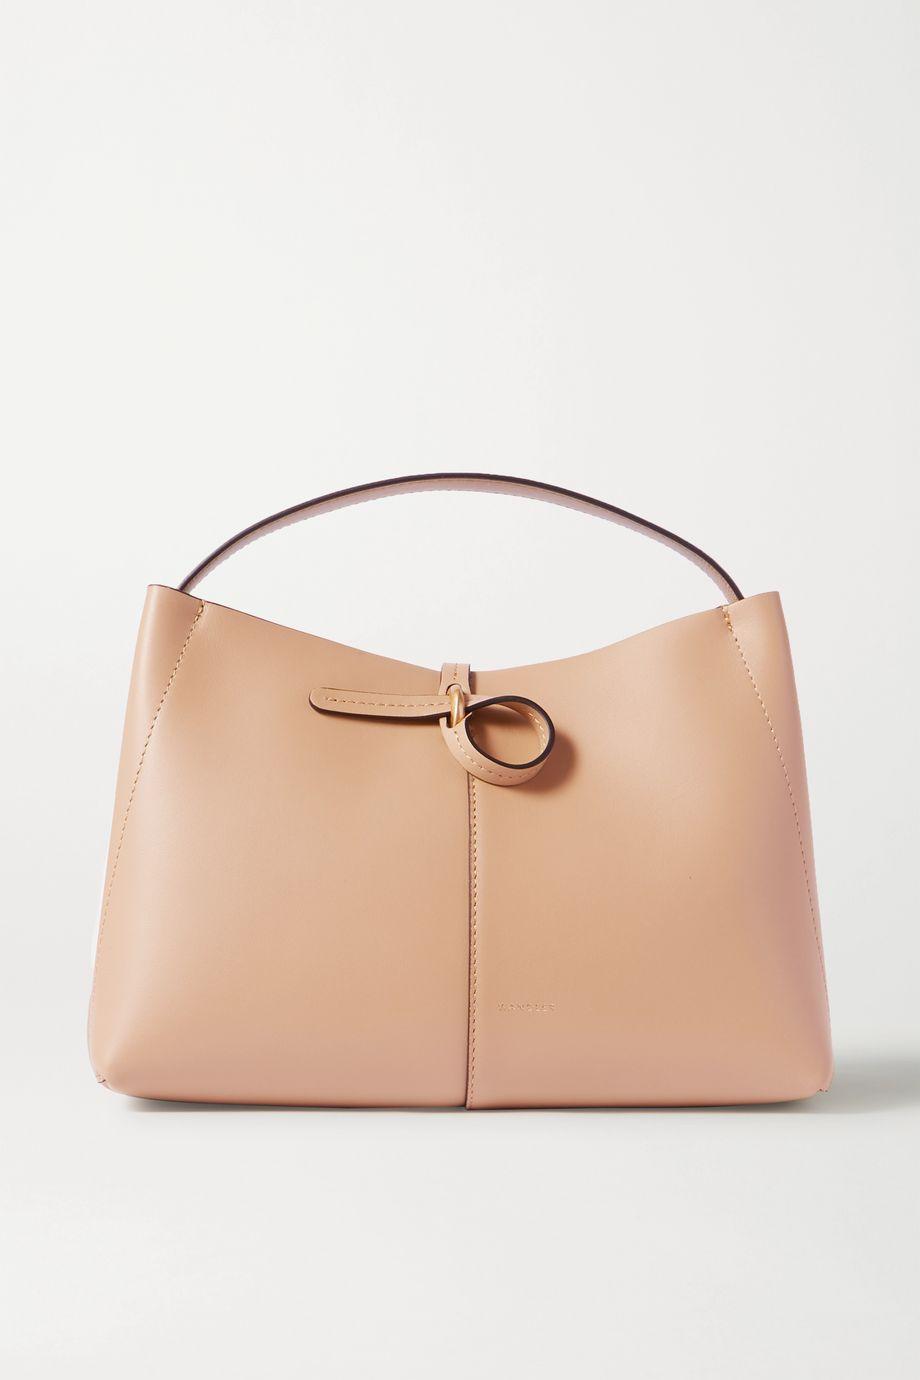 Wandler Ava mini leather tote